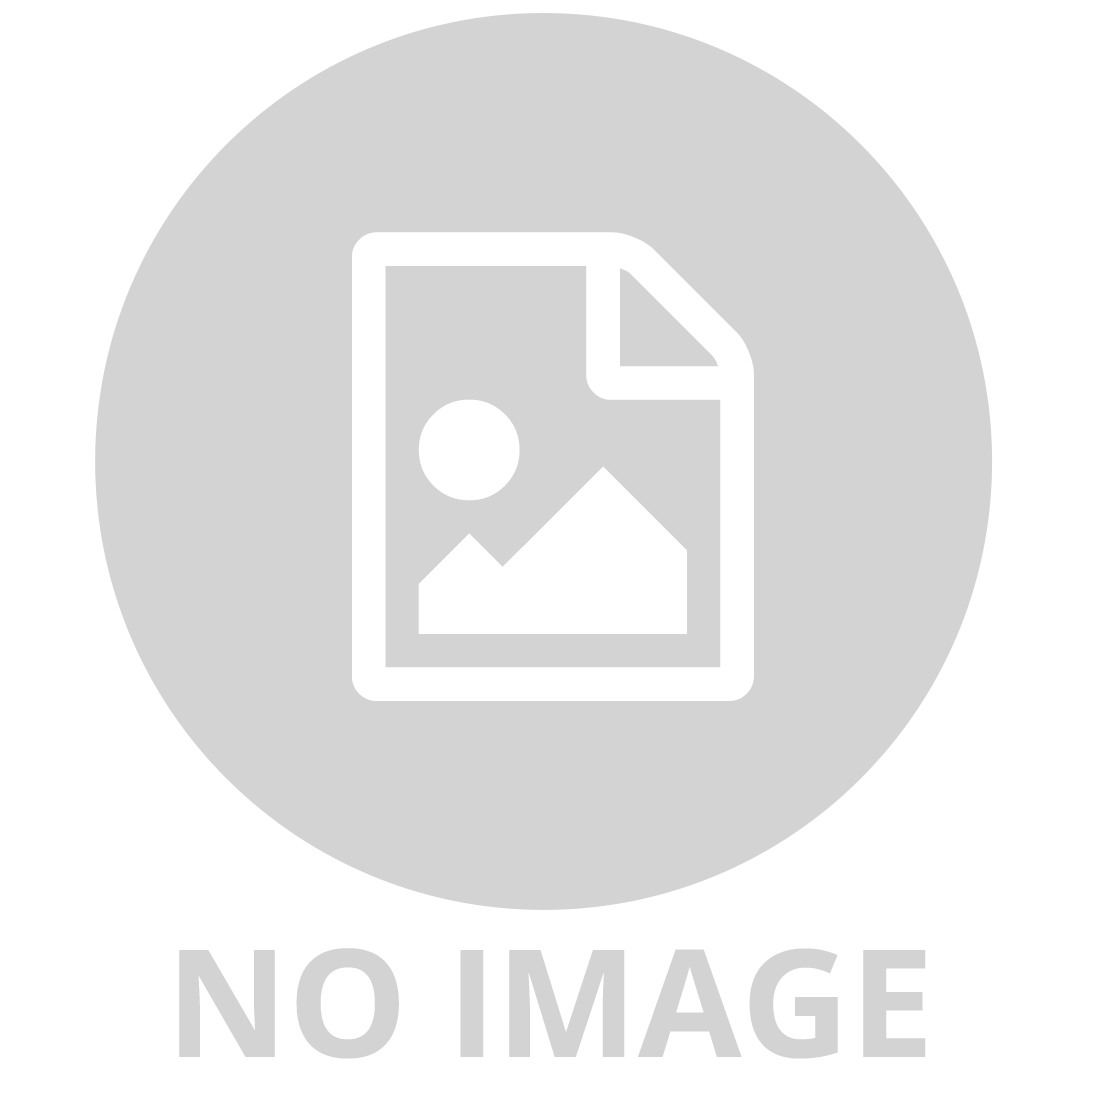 15 PIECE TIN TEA SET - POLKA DOT